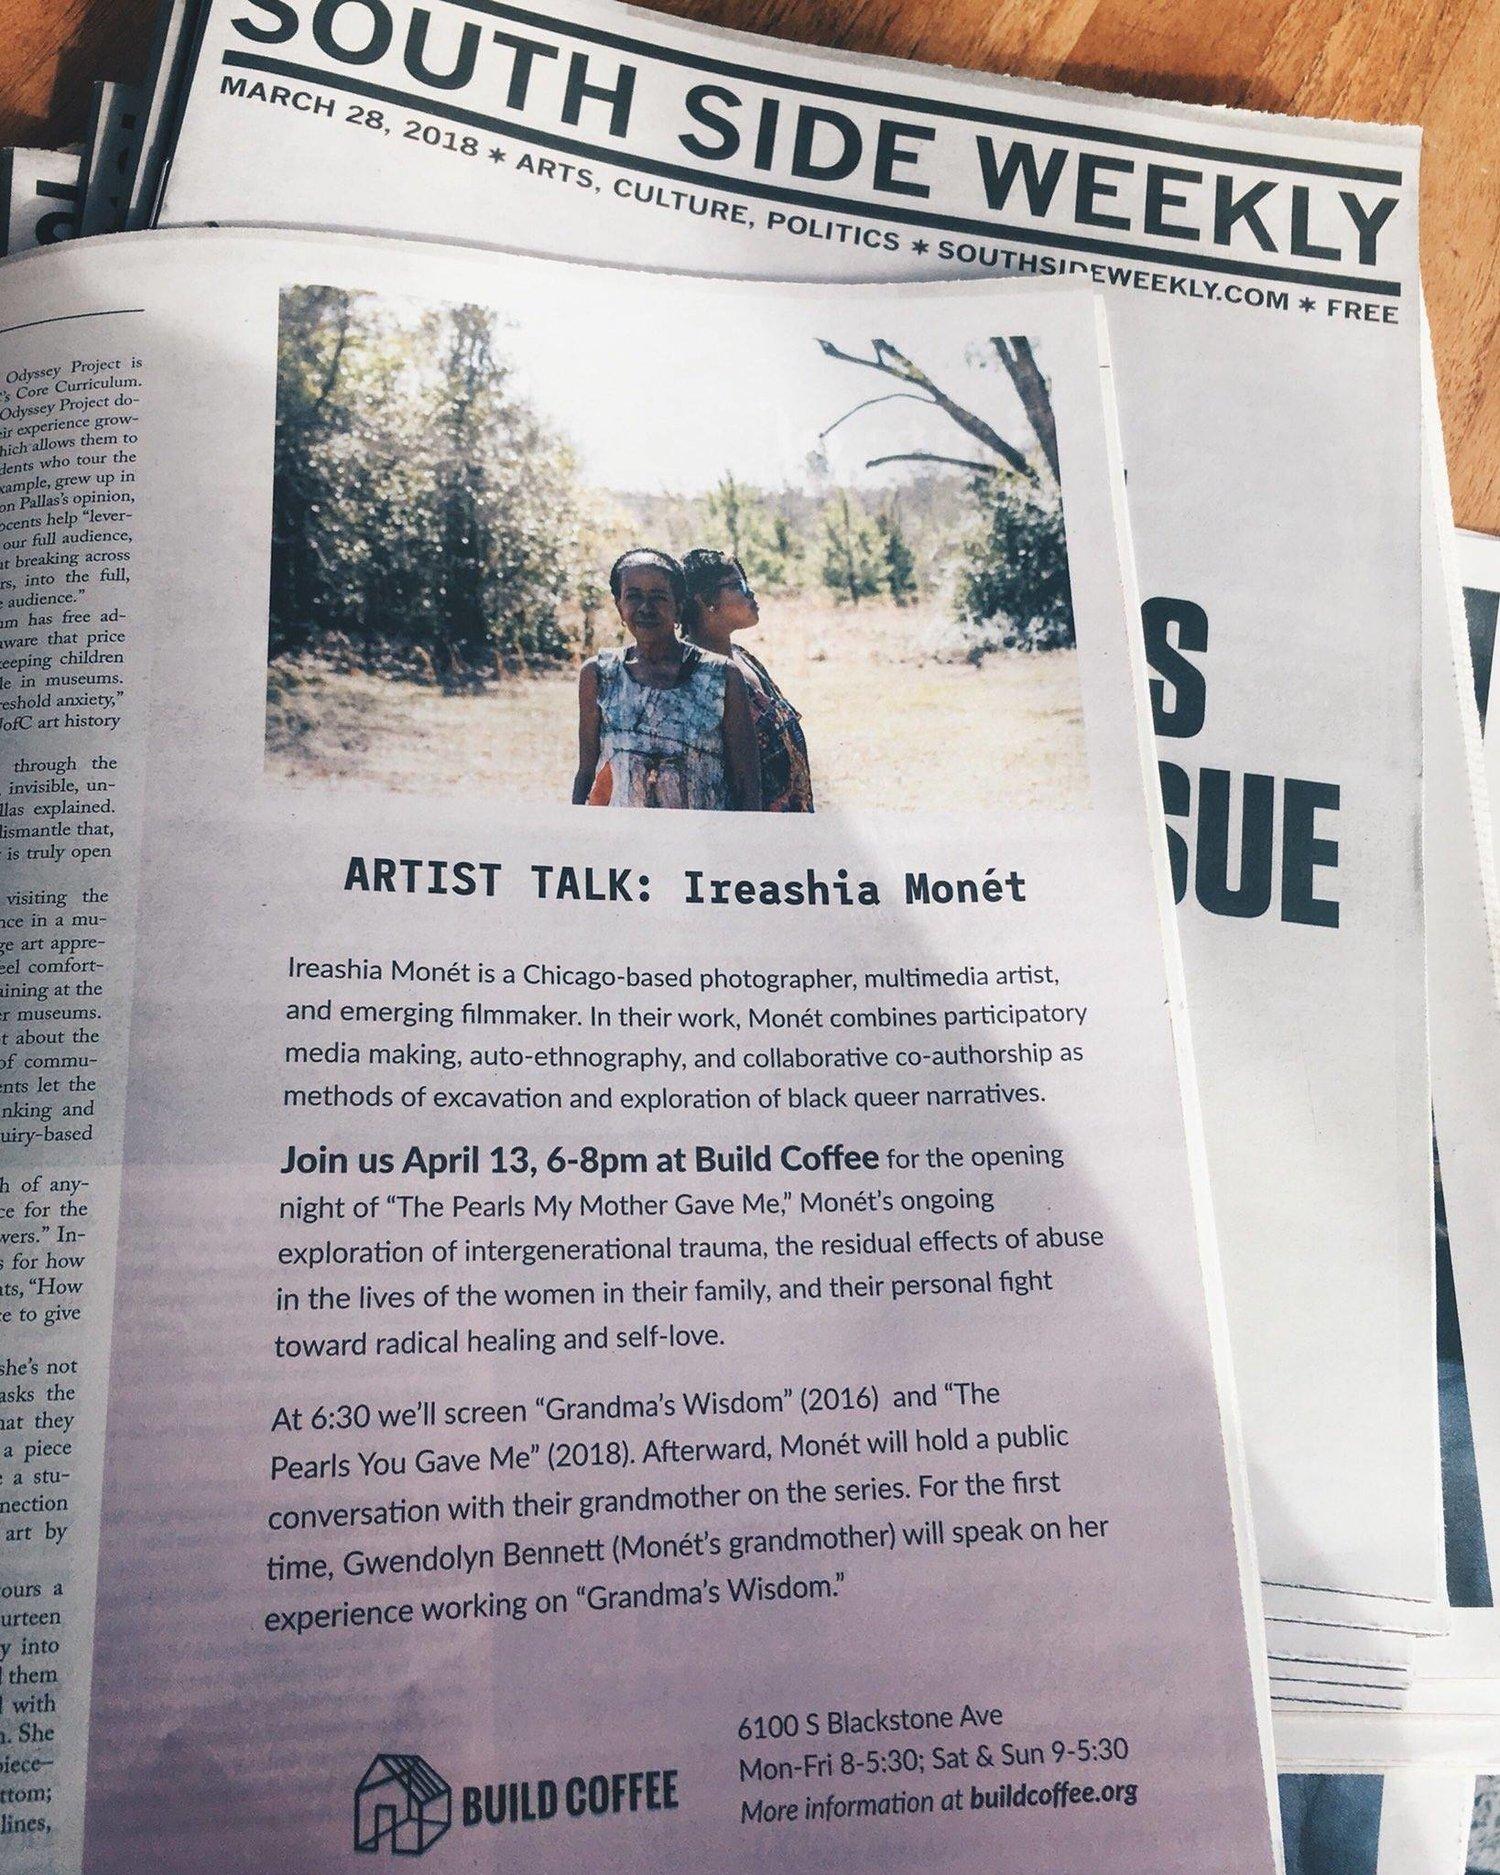 Artist Talk with Ireashia Monét at Build Coffee -- April 13